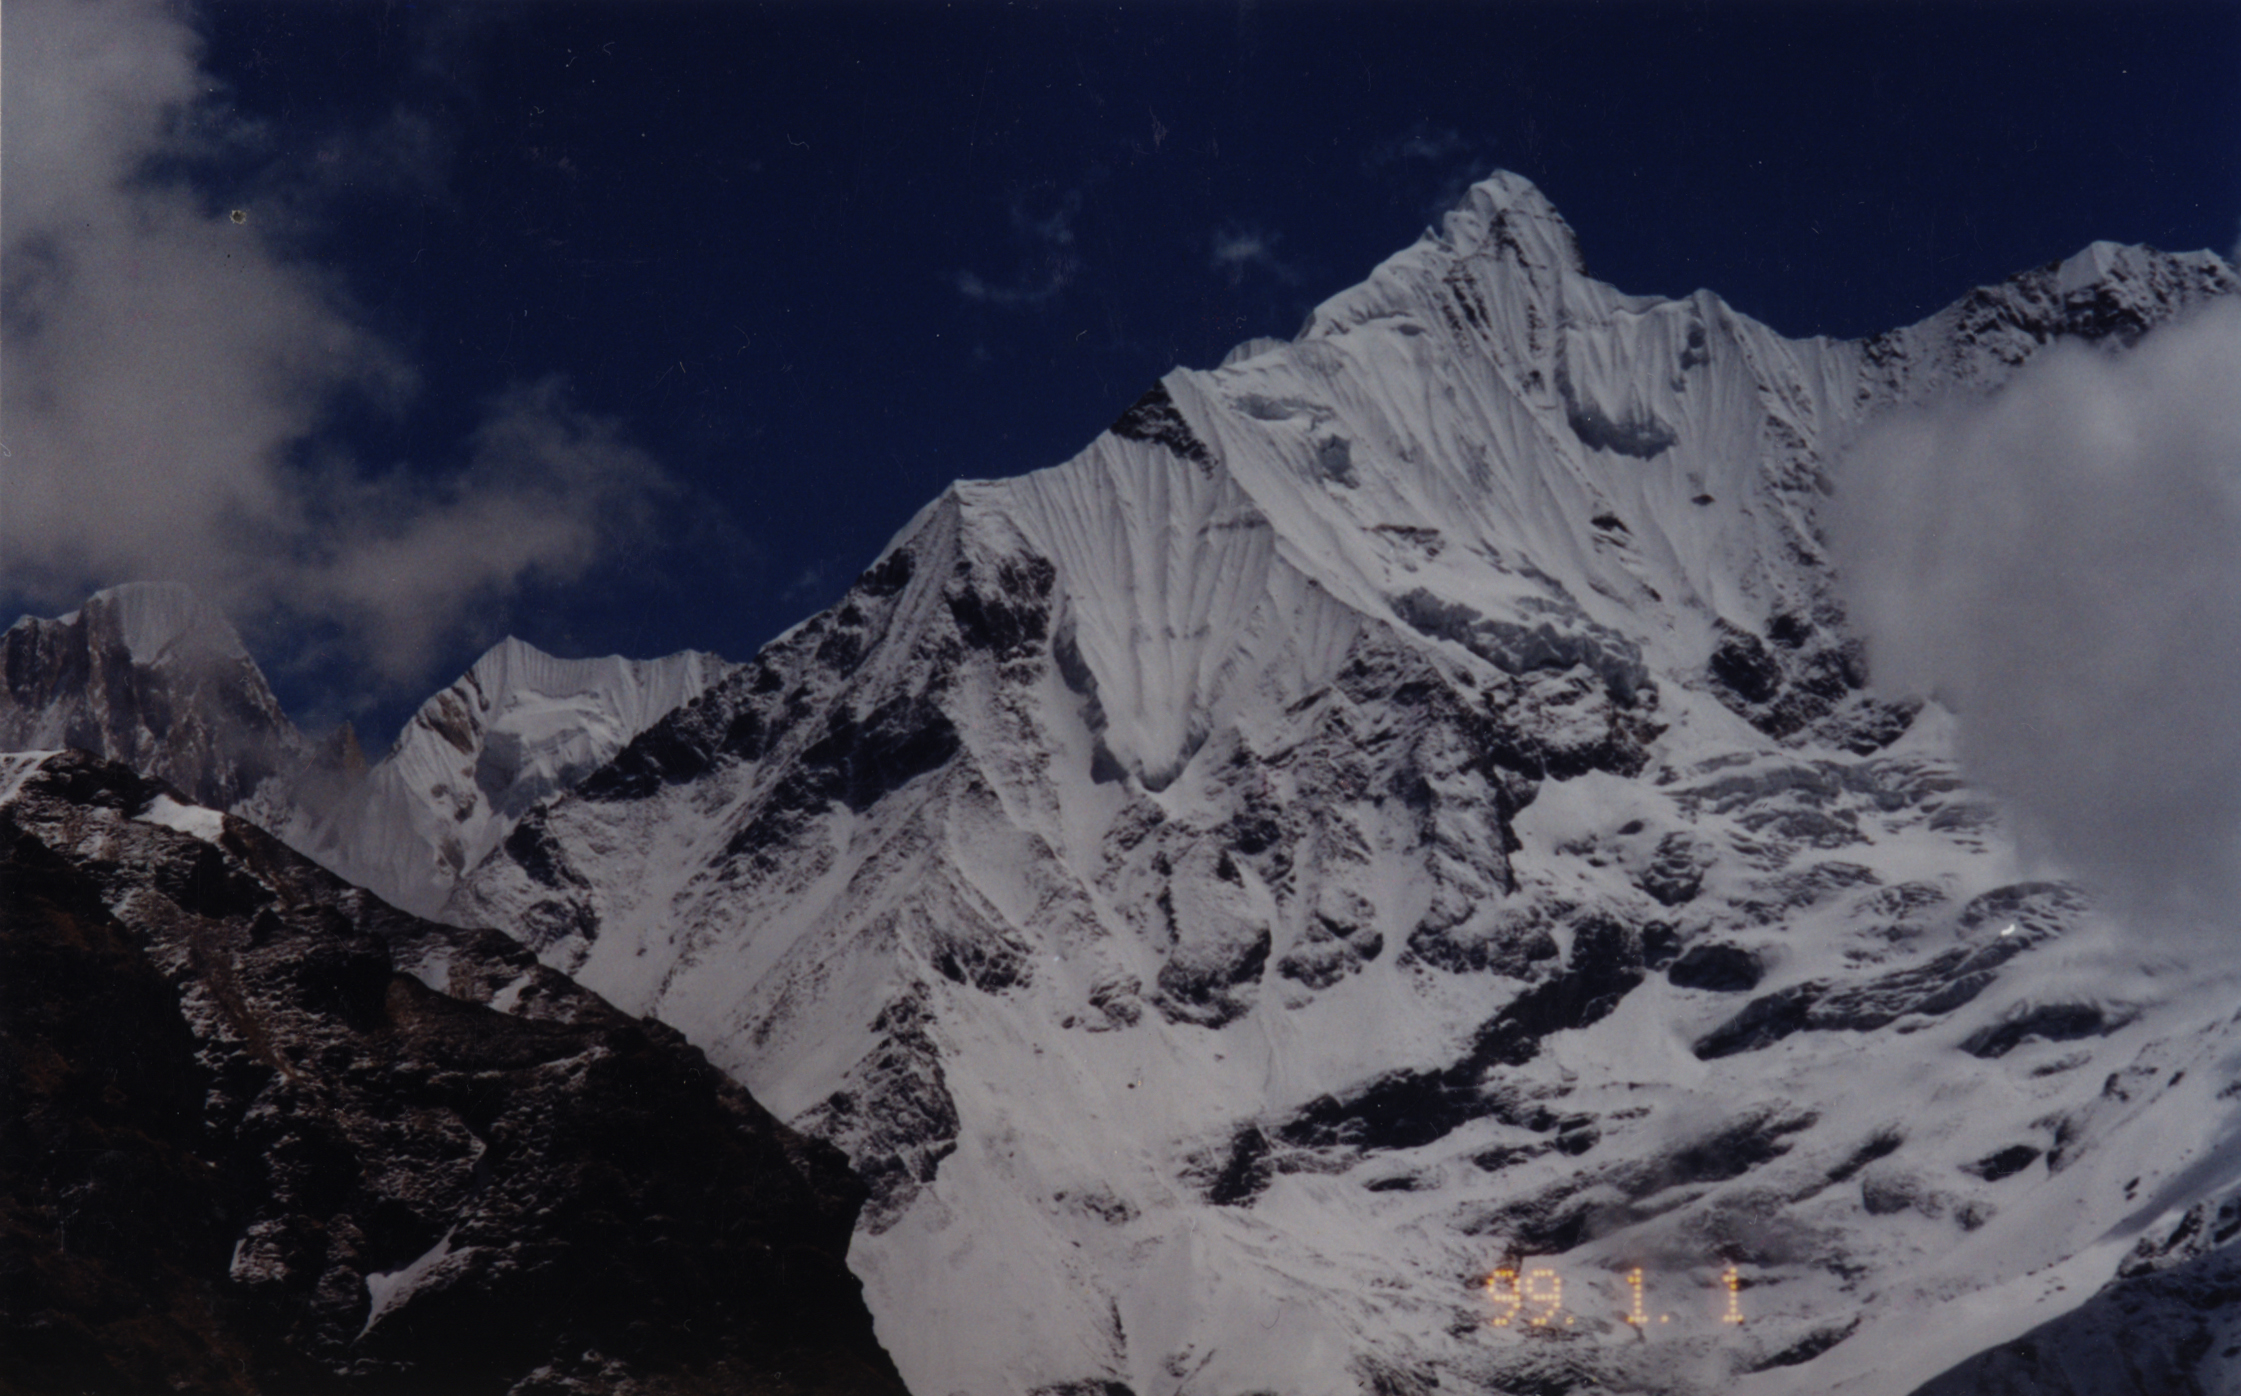 iuliana impressive mountain mountains range snow peaked capped white peaks